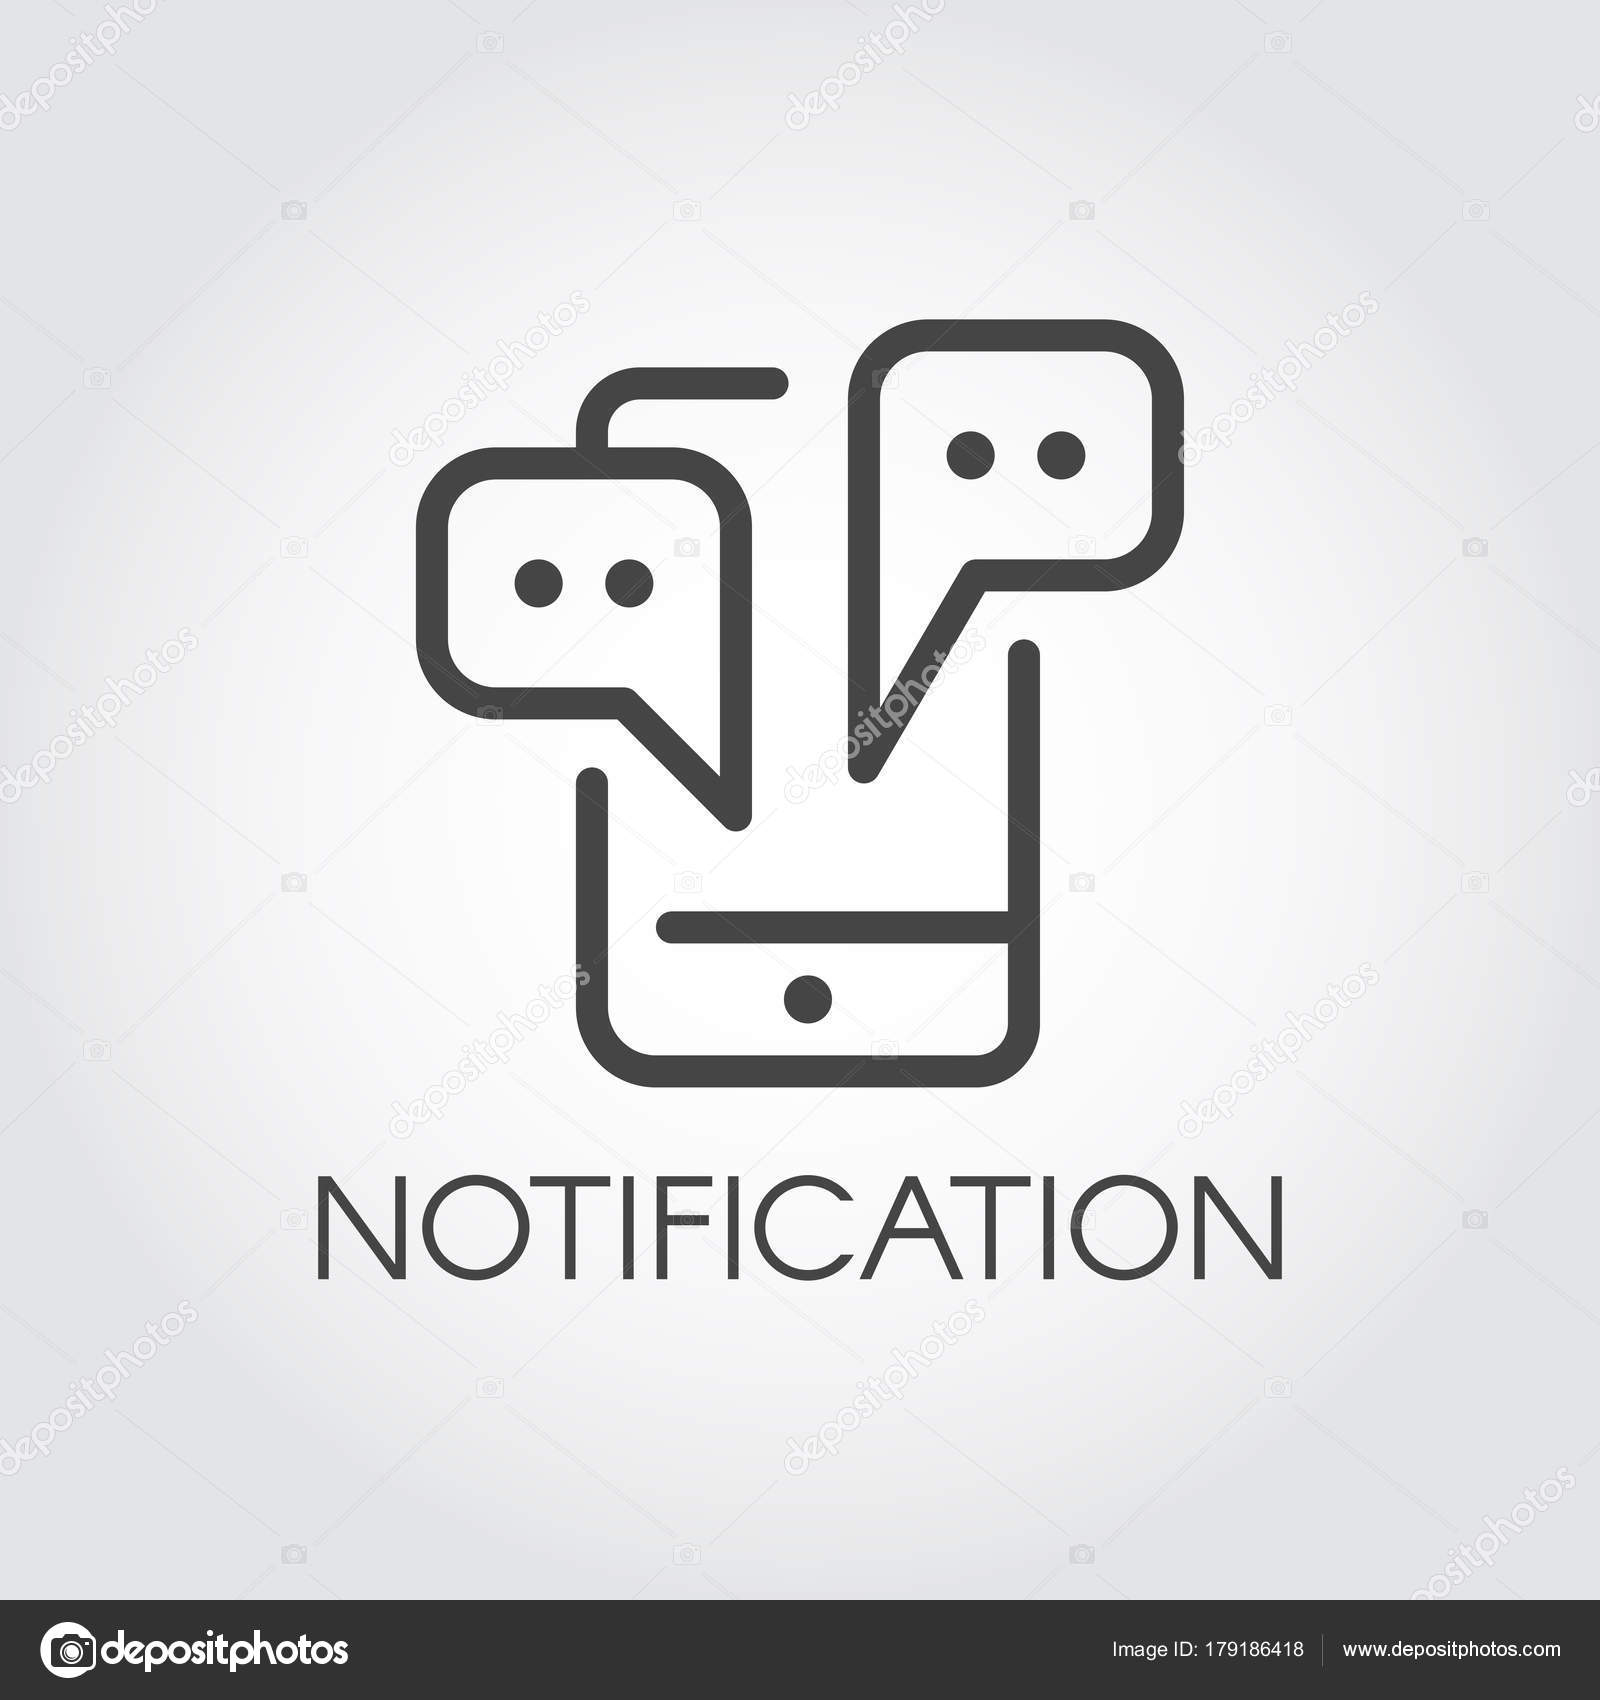 fish icon notification